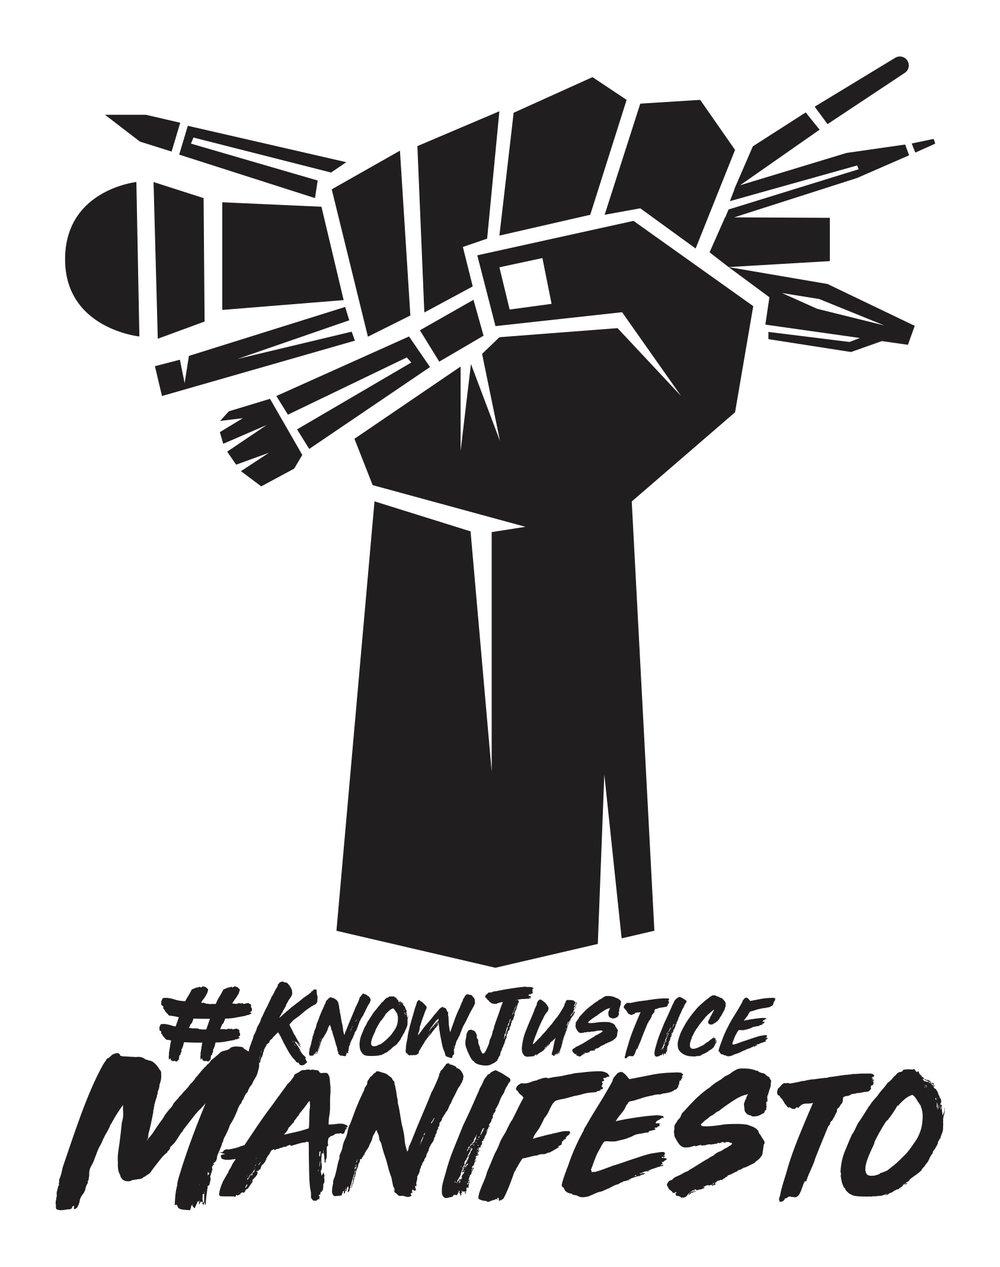 KnowJustice_Manifesto_TShirt.jpg